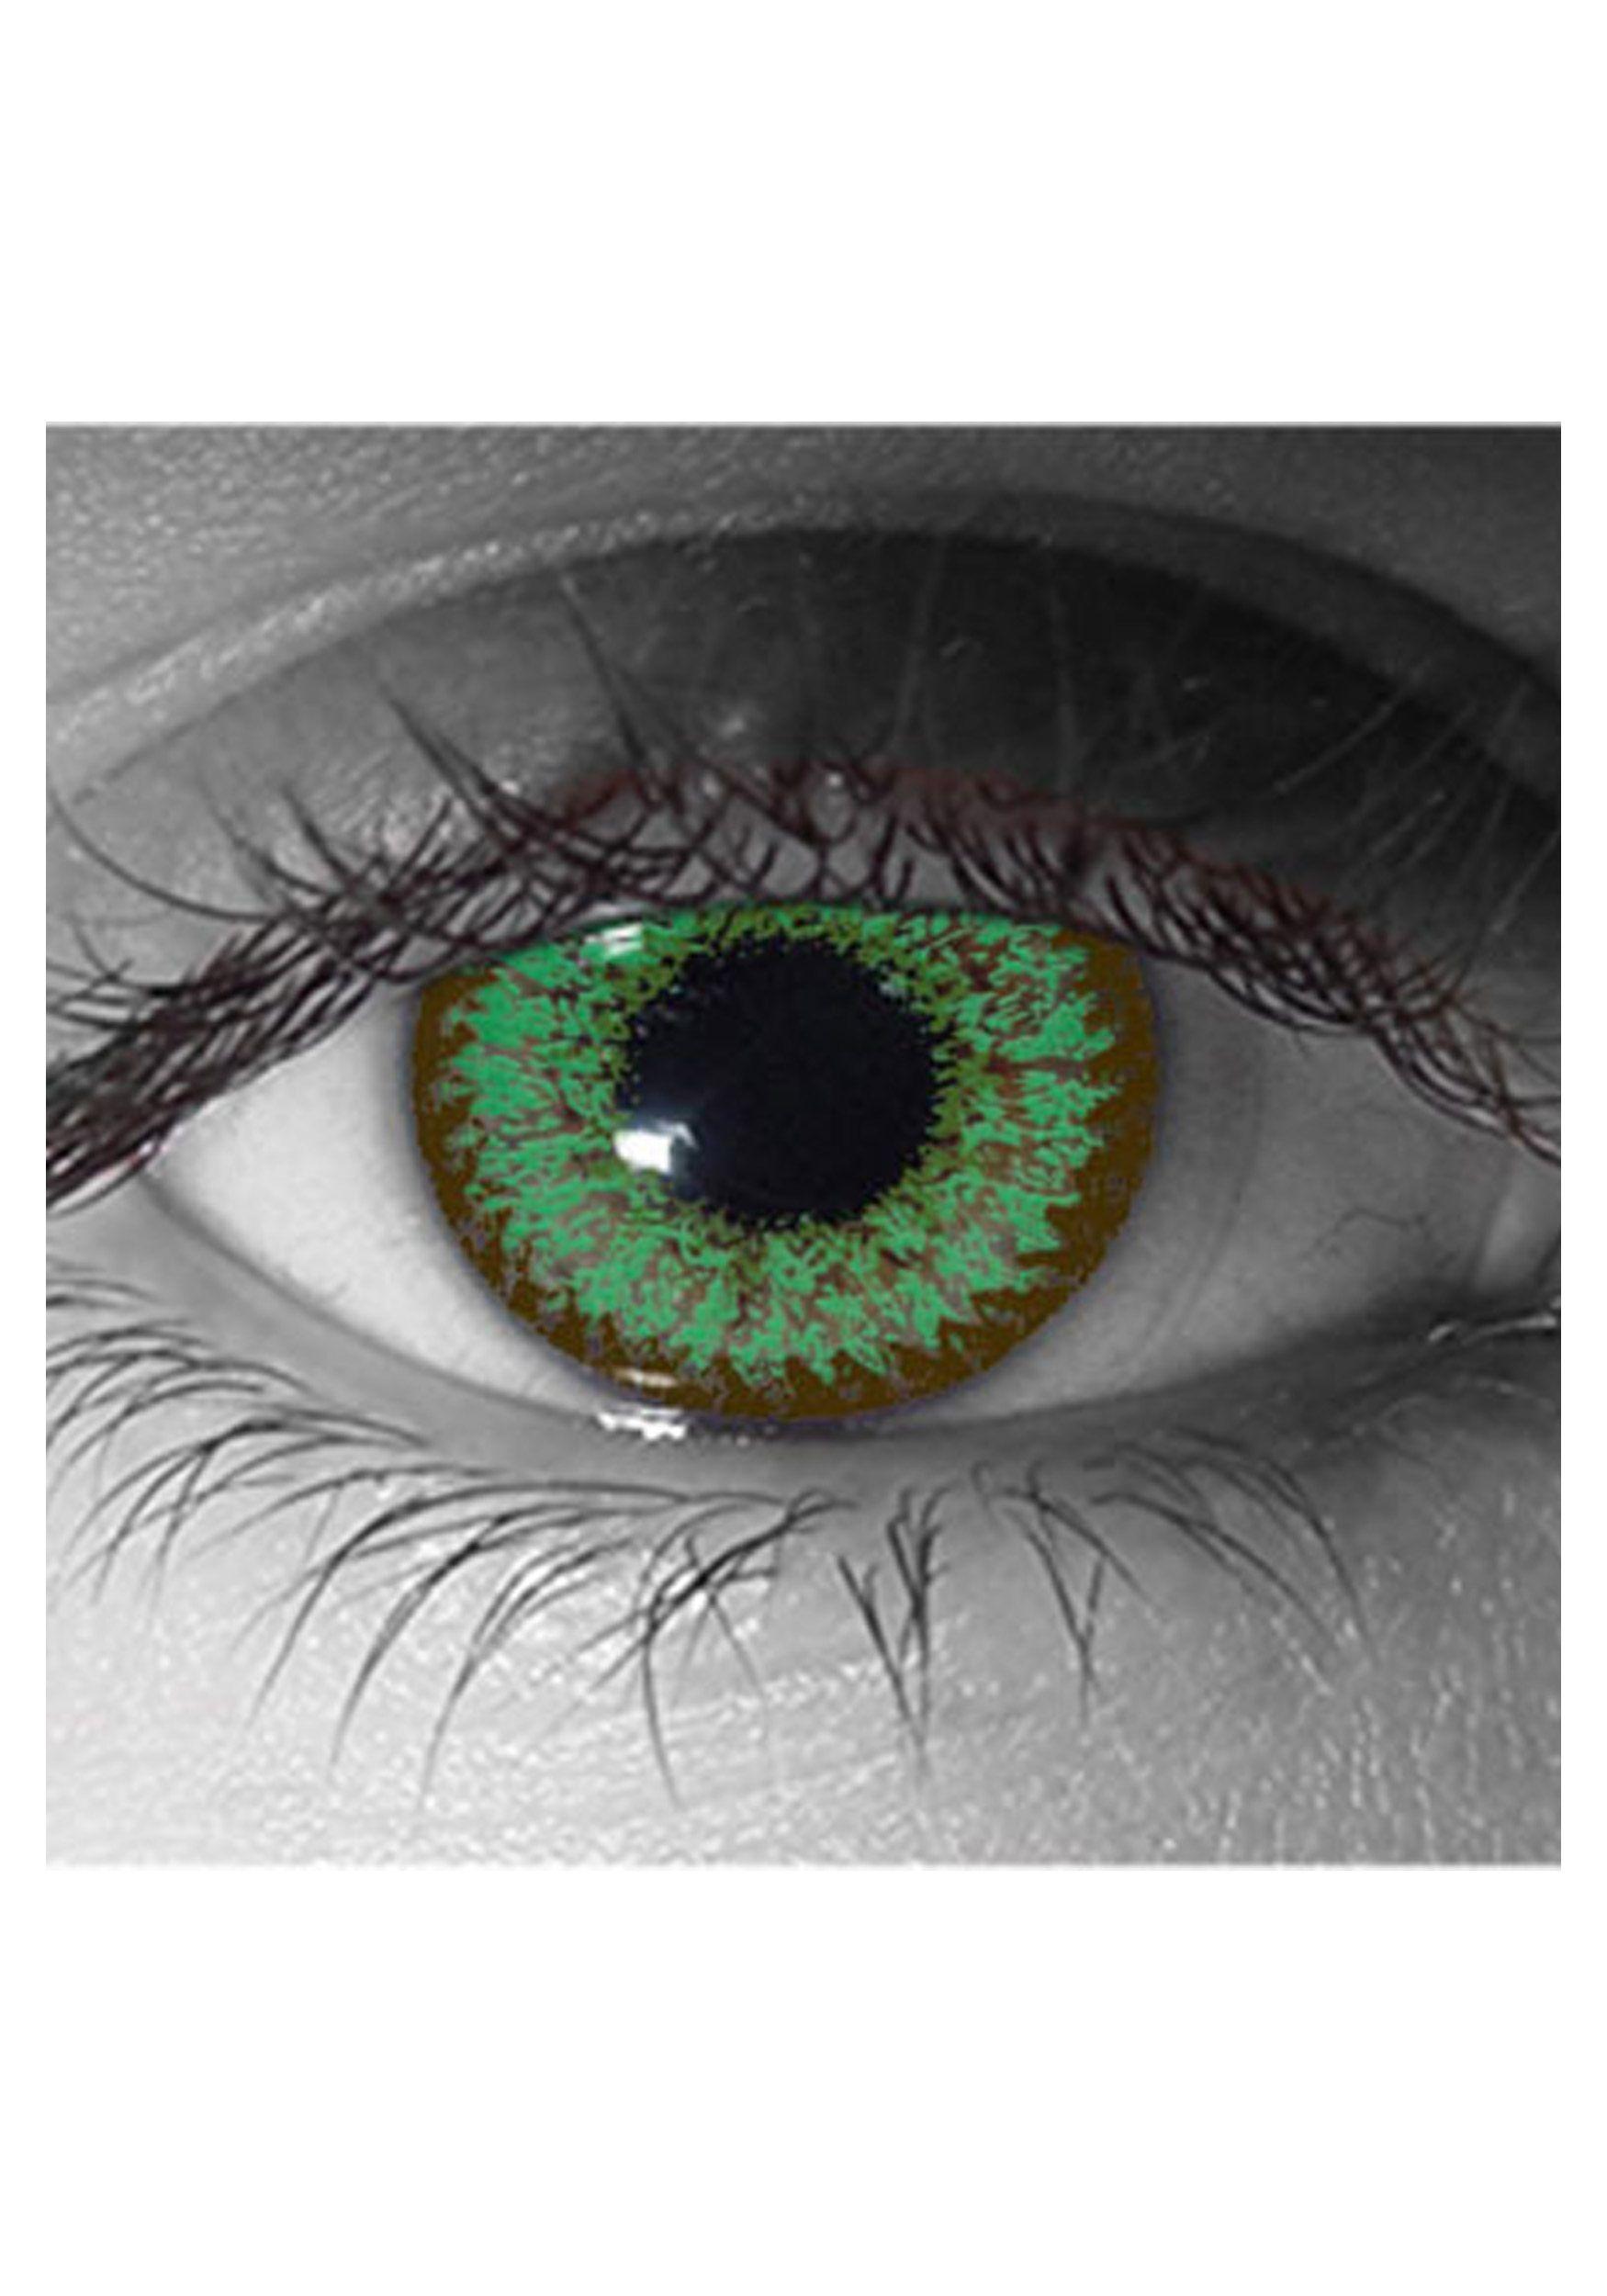 American Venus Jade Green Contact Lens · Green ContactsColored ContactsHalloween Costume ...  sc 1 st  Pinterest & American Venus Jade Green Contact Lens | Costume ideas | Pinterest ...